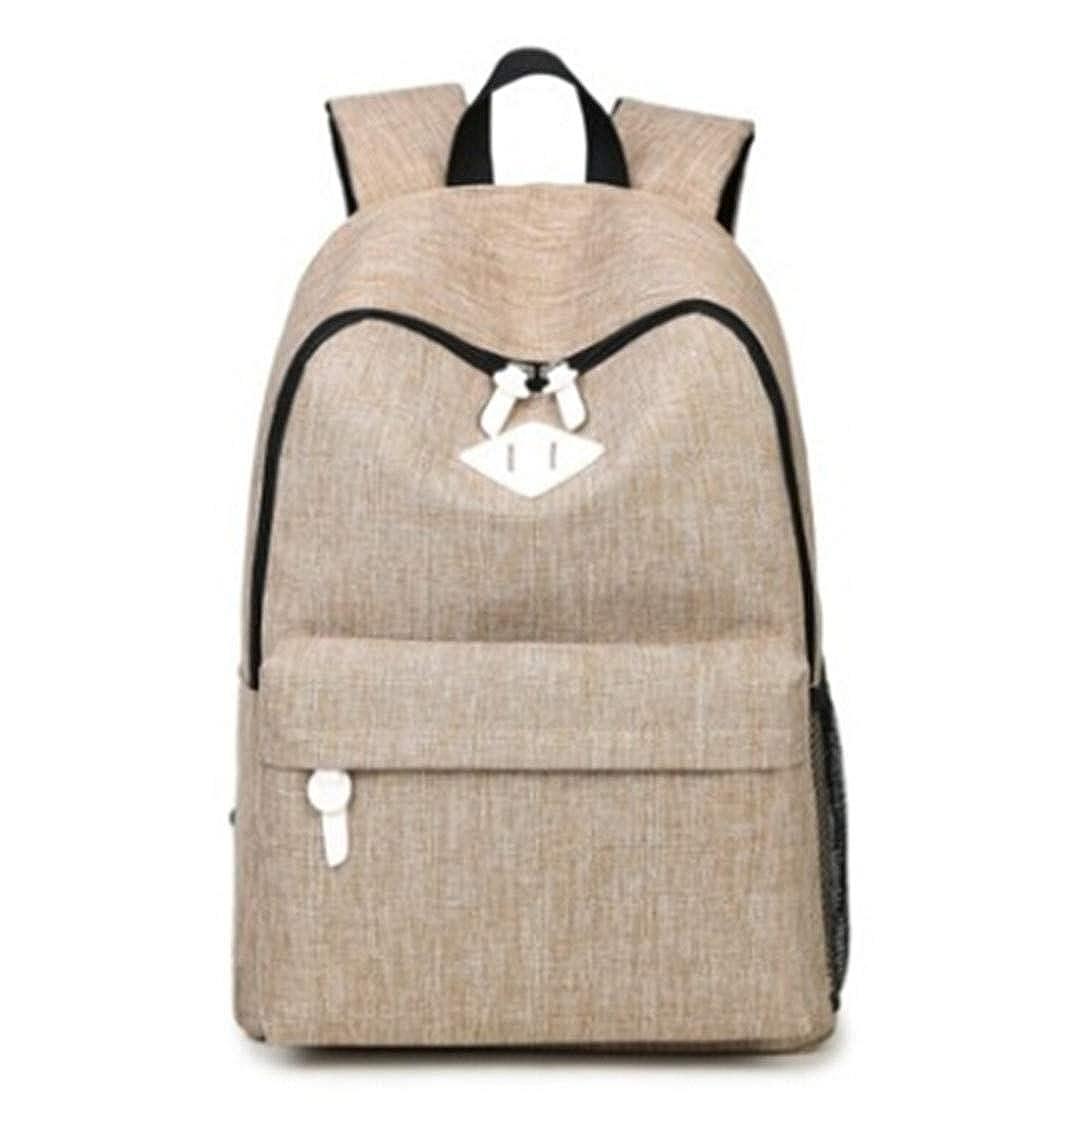 Amazon.com | Fashion Canvas Backpacks Large School Bags For Girls Boys Teenagers Laptop Bags Travel Rucksack Black 29x43x14cm | Kids Backpacks